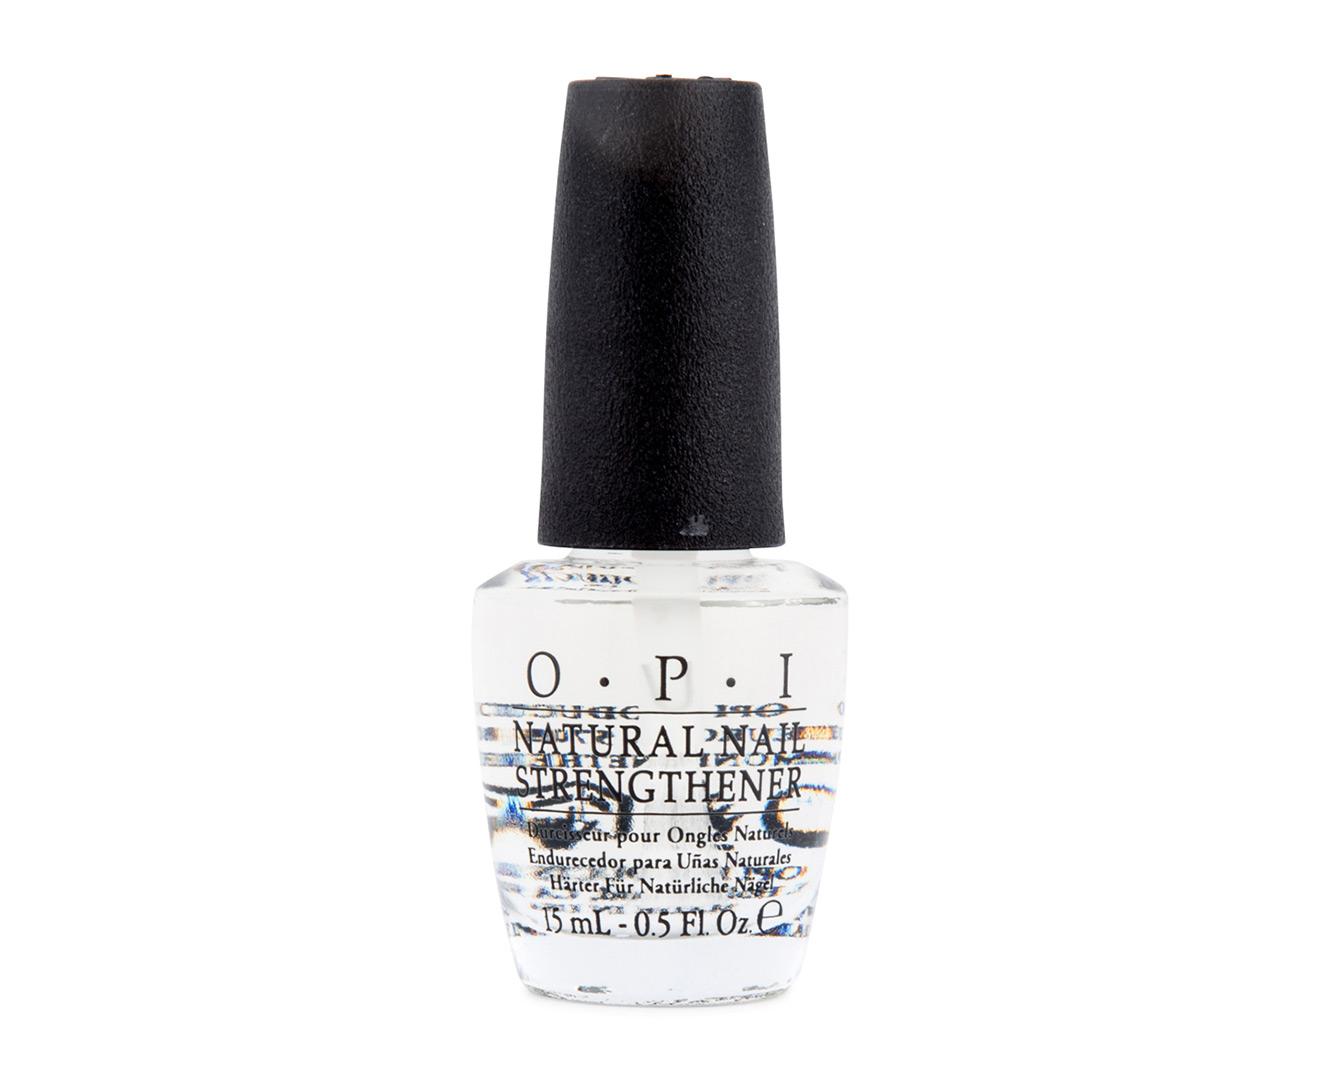 OPI Natural Nail Strengthener 15mL | eBay